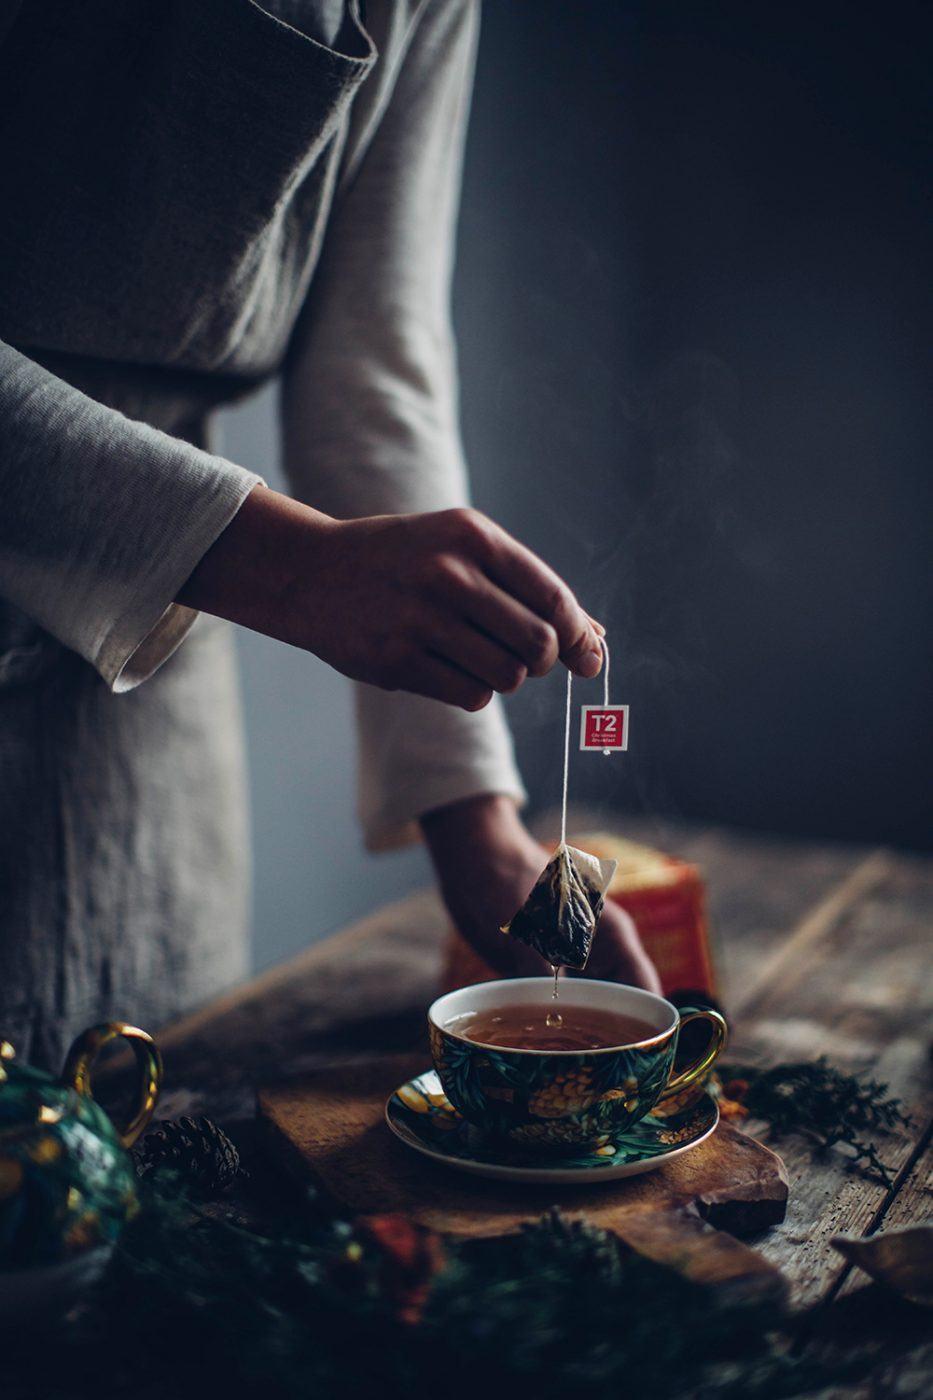 T2 Tea Gathering